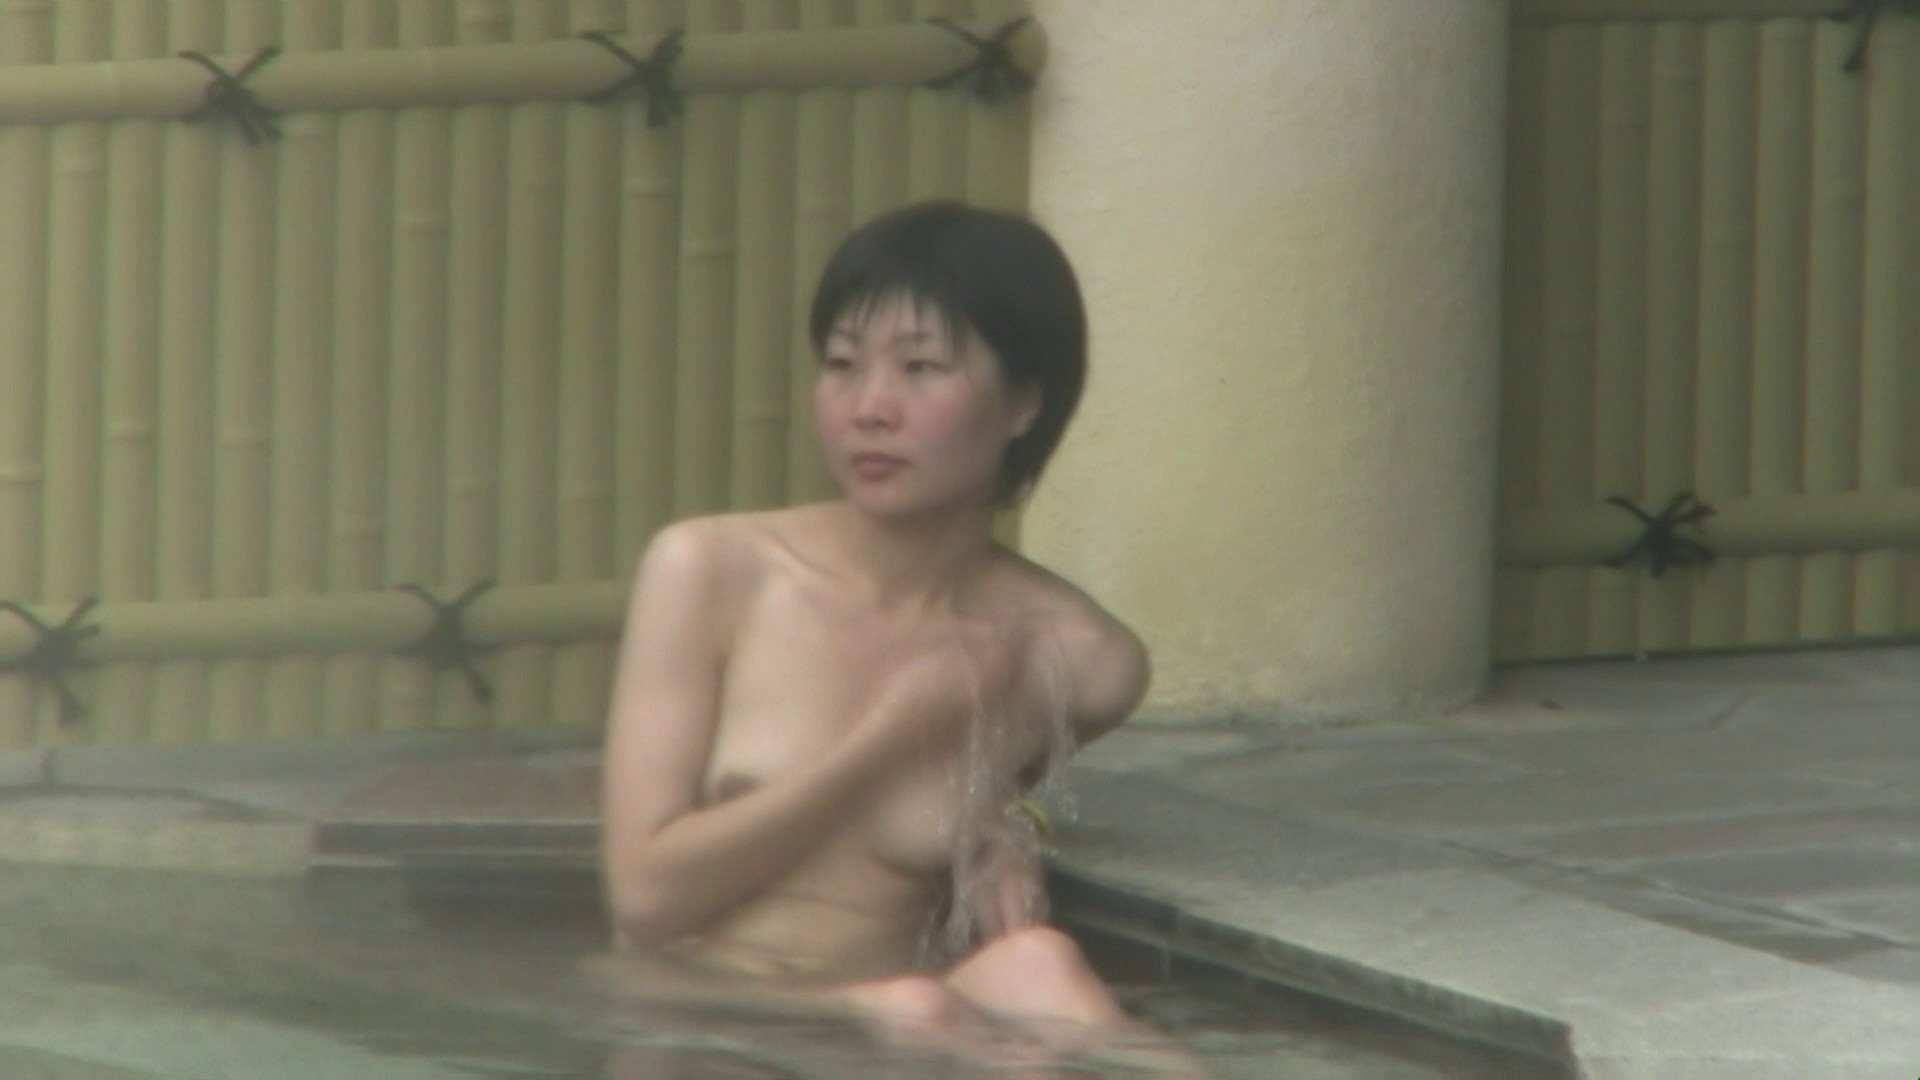 Aquaな露天風呂Vol.75【VIP限定】 露天風呂編  99PIX 76